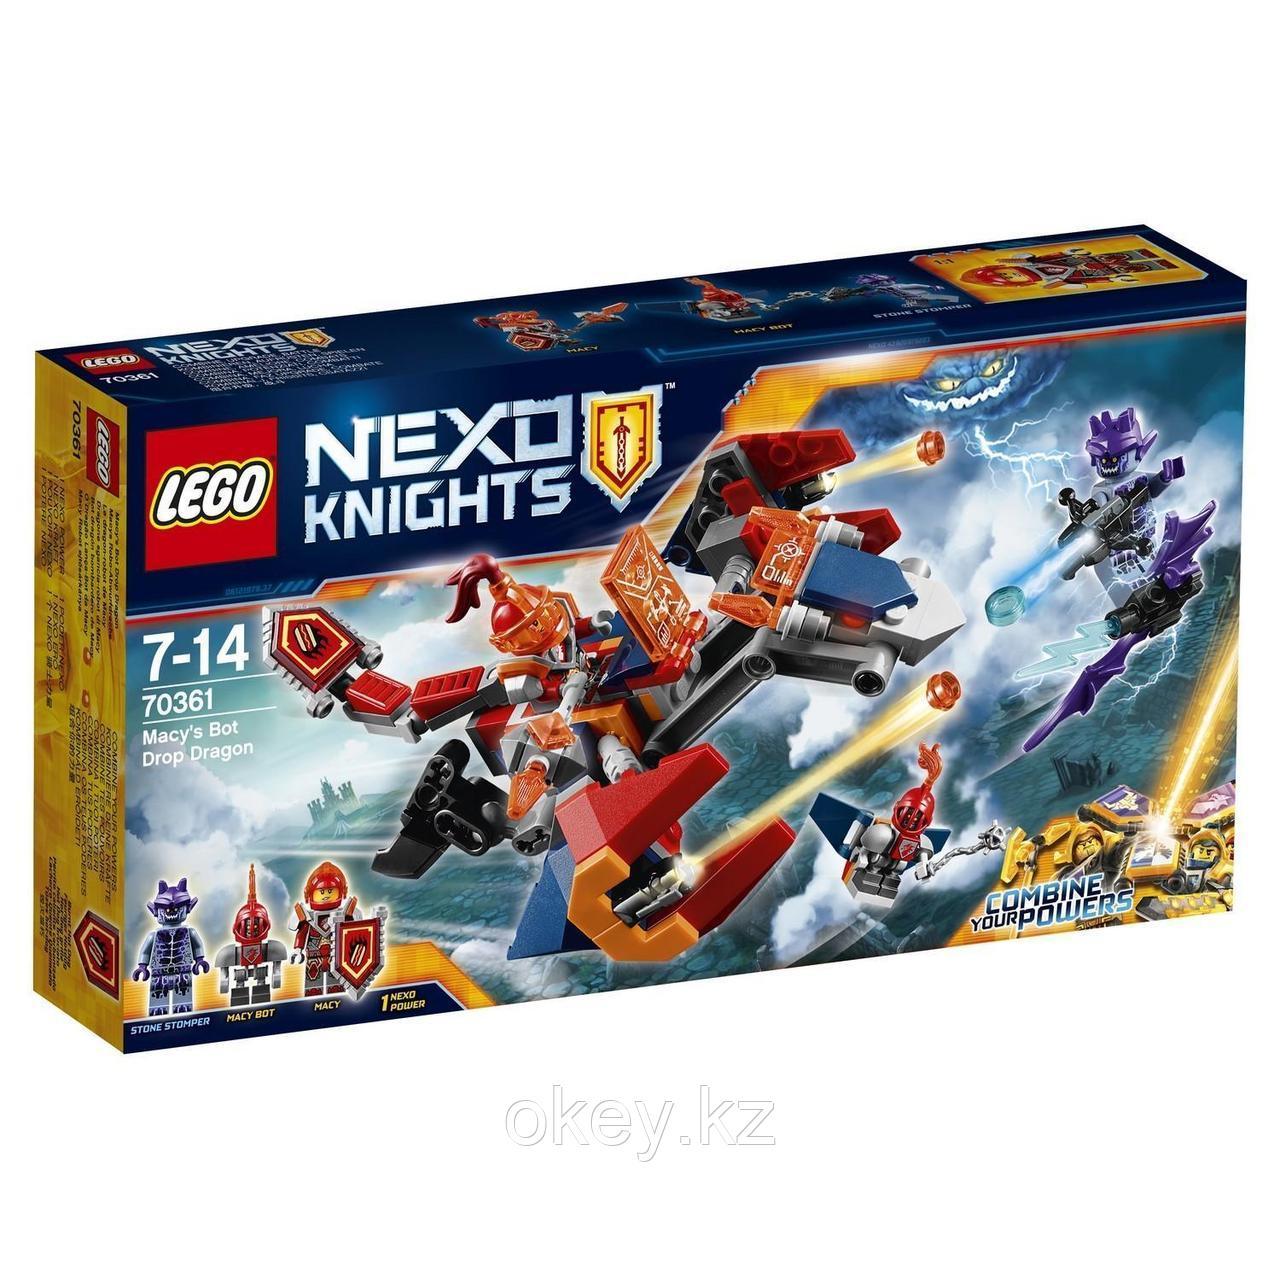 LEGO Nexo Knights: Дракон Мэйси 70361